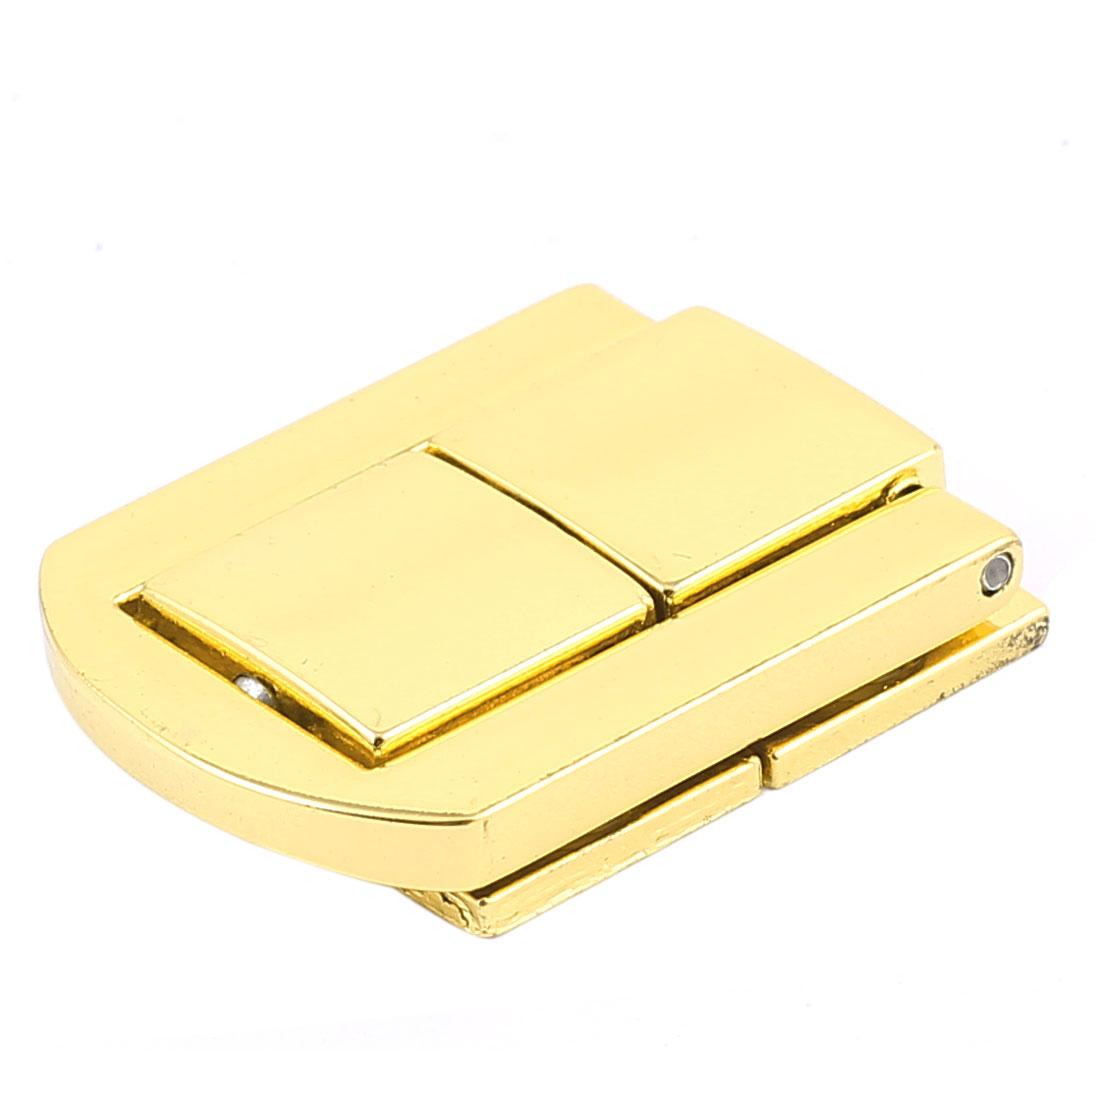 30mm x 25mm Latch Jewelery Box Guitar Case Suitcase Drawbolt Closure Gold Tone